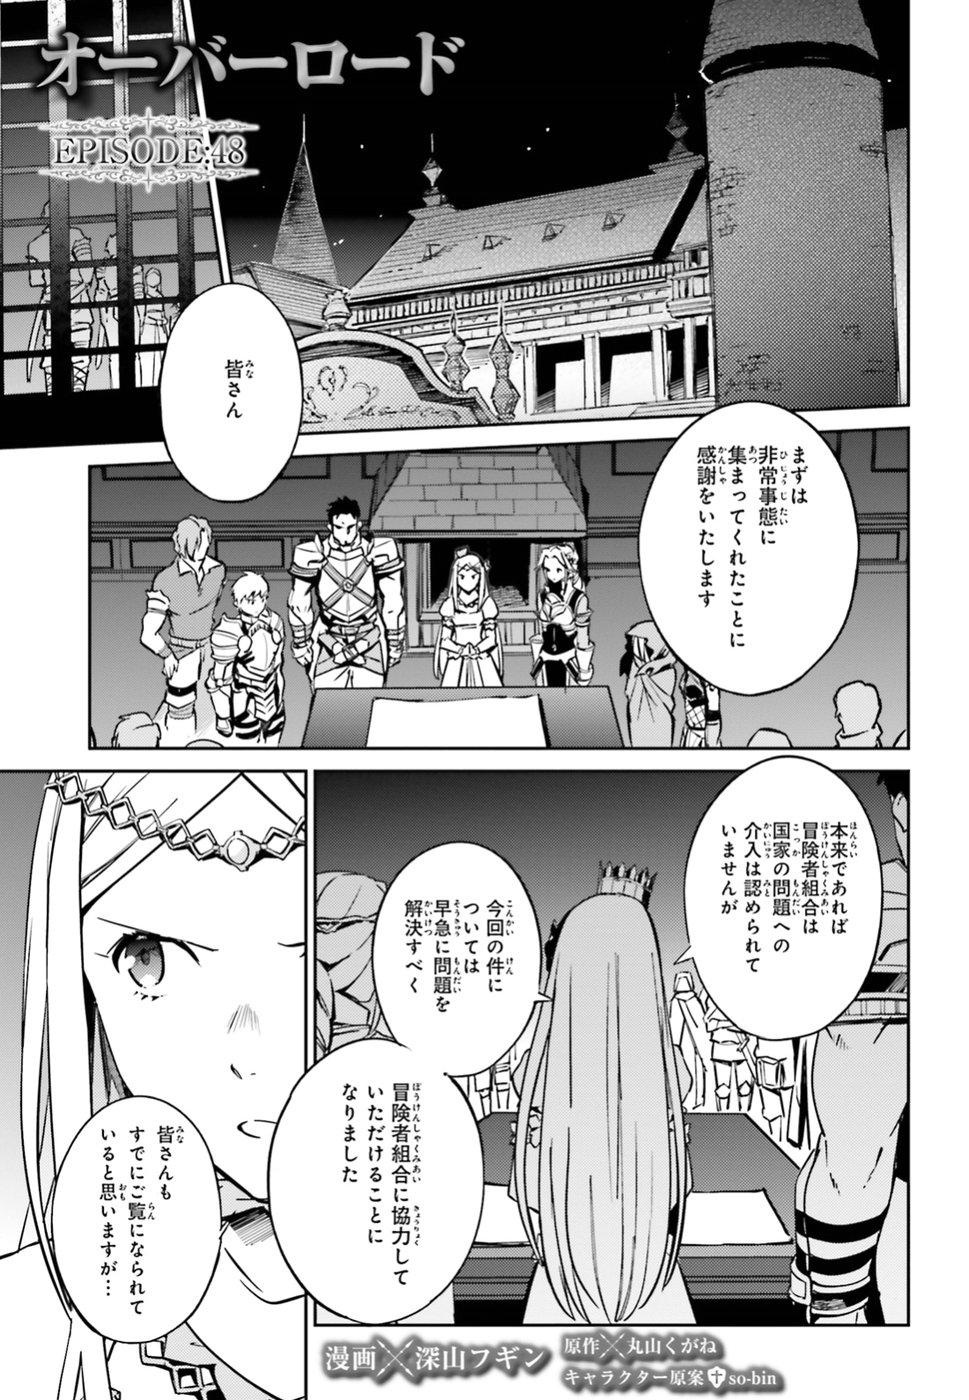 Overlord Manga Chapter 48